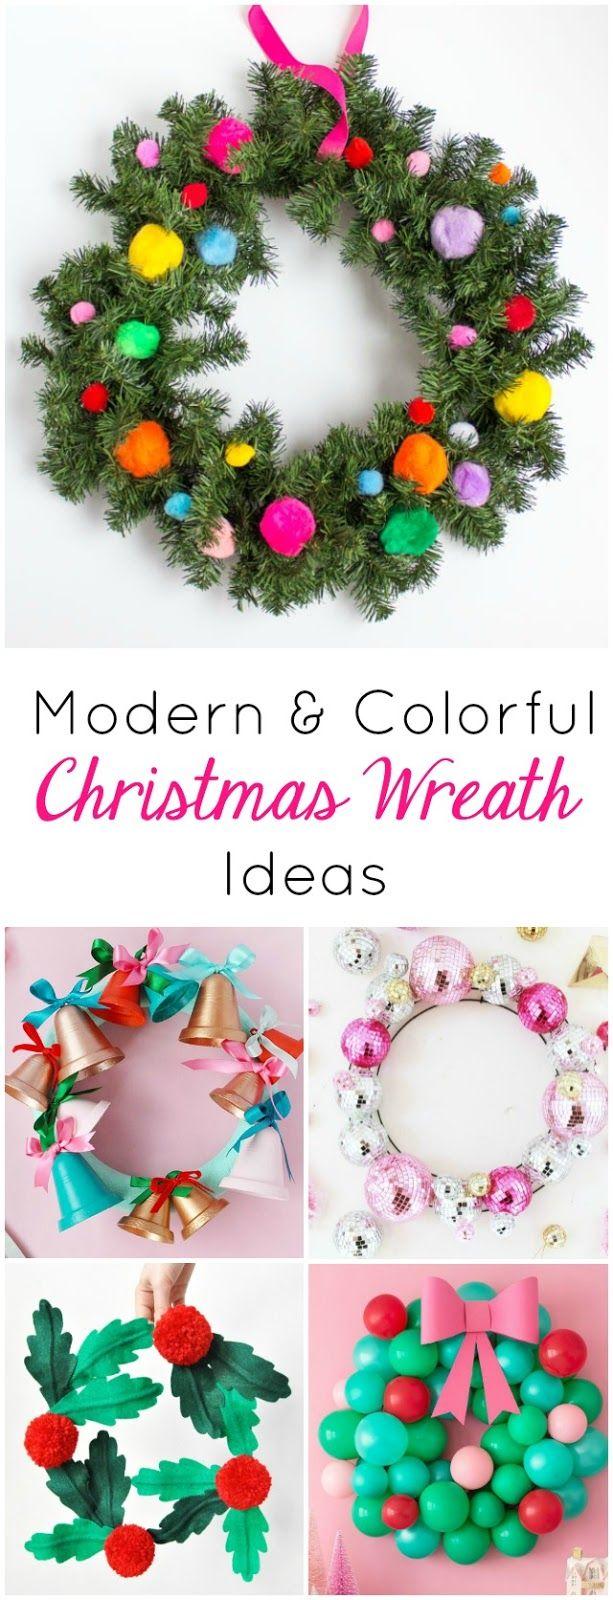 12 Modern and Colorful Christmas Wreath Ideas   Wreaths crafts, DIY ...